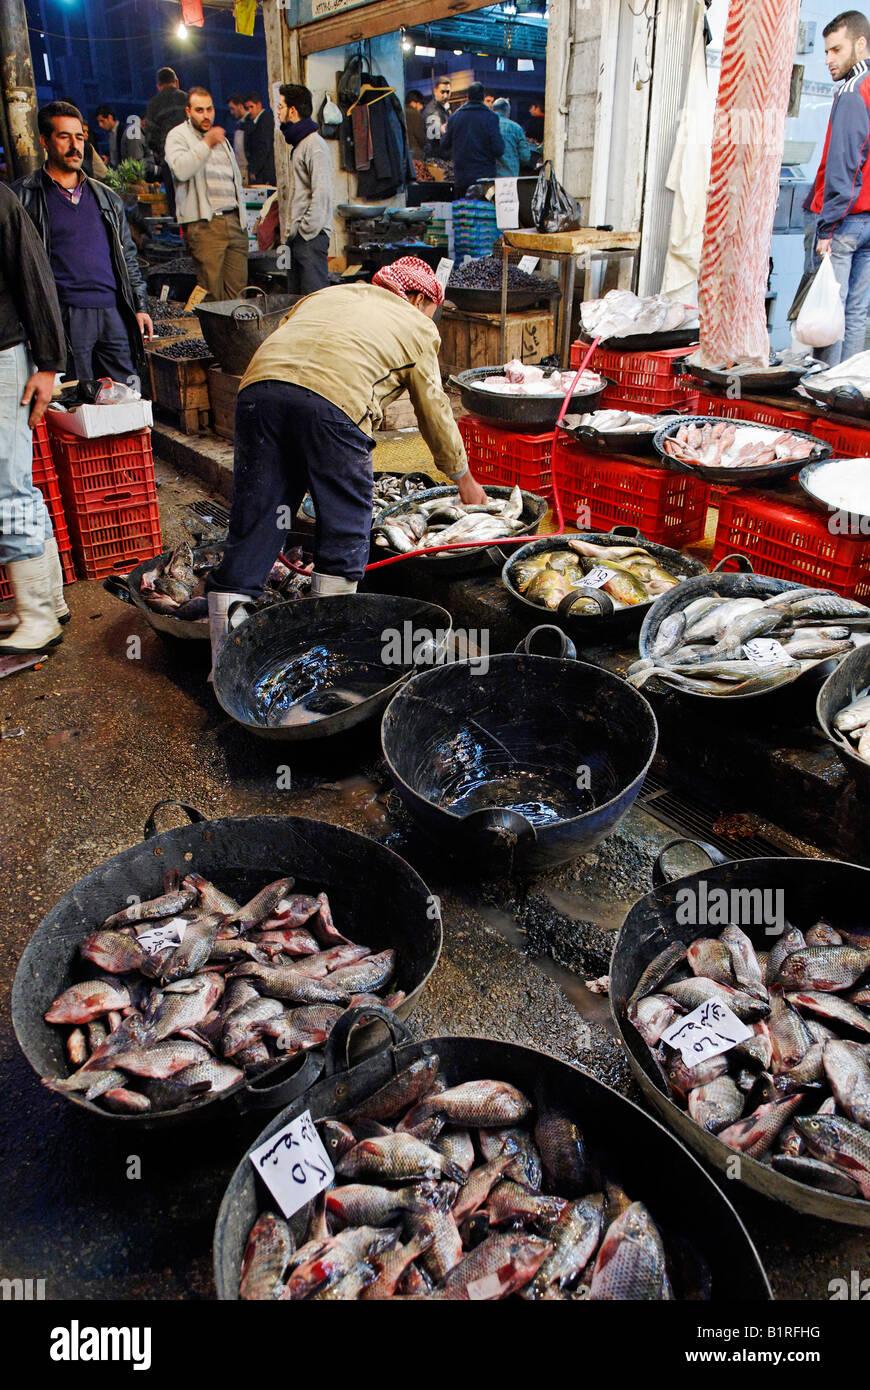 Fish market in the souk, Damaskus bazaar, UNESCO world heritage site, Syria, Arabia, Middle East - Stock Image